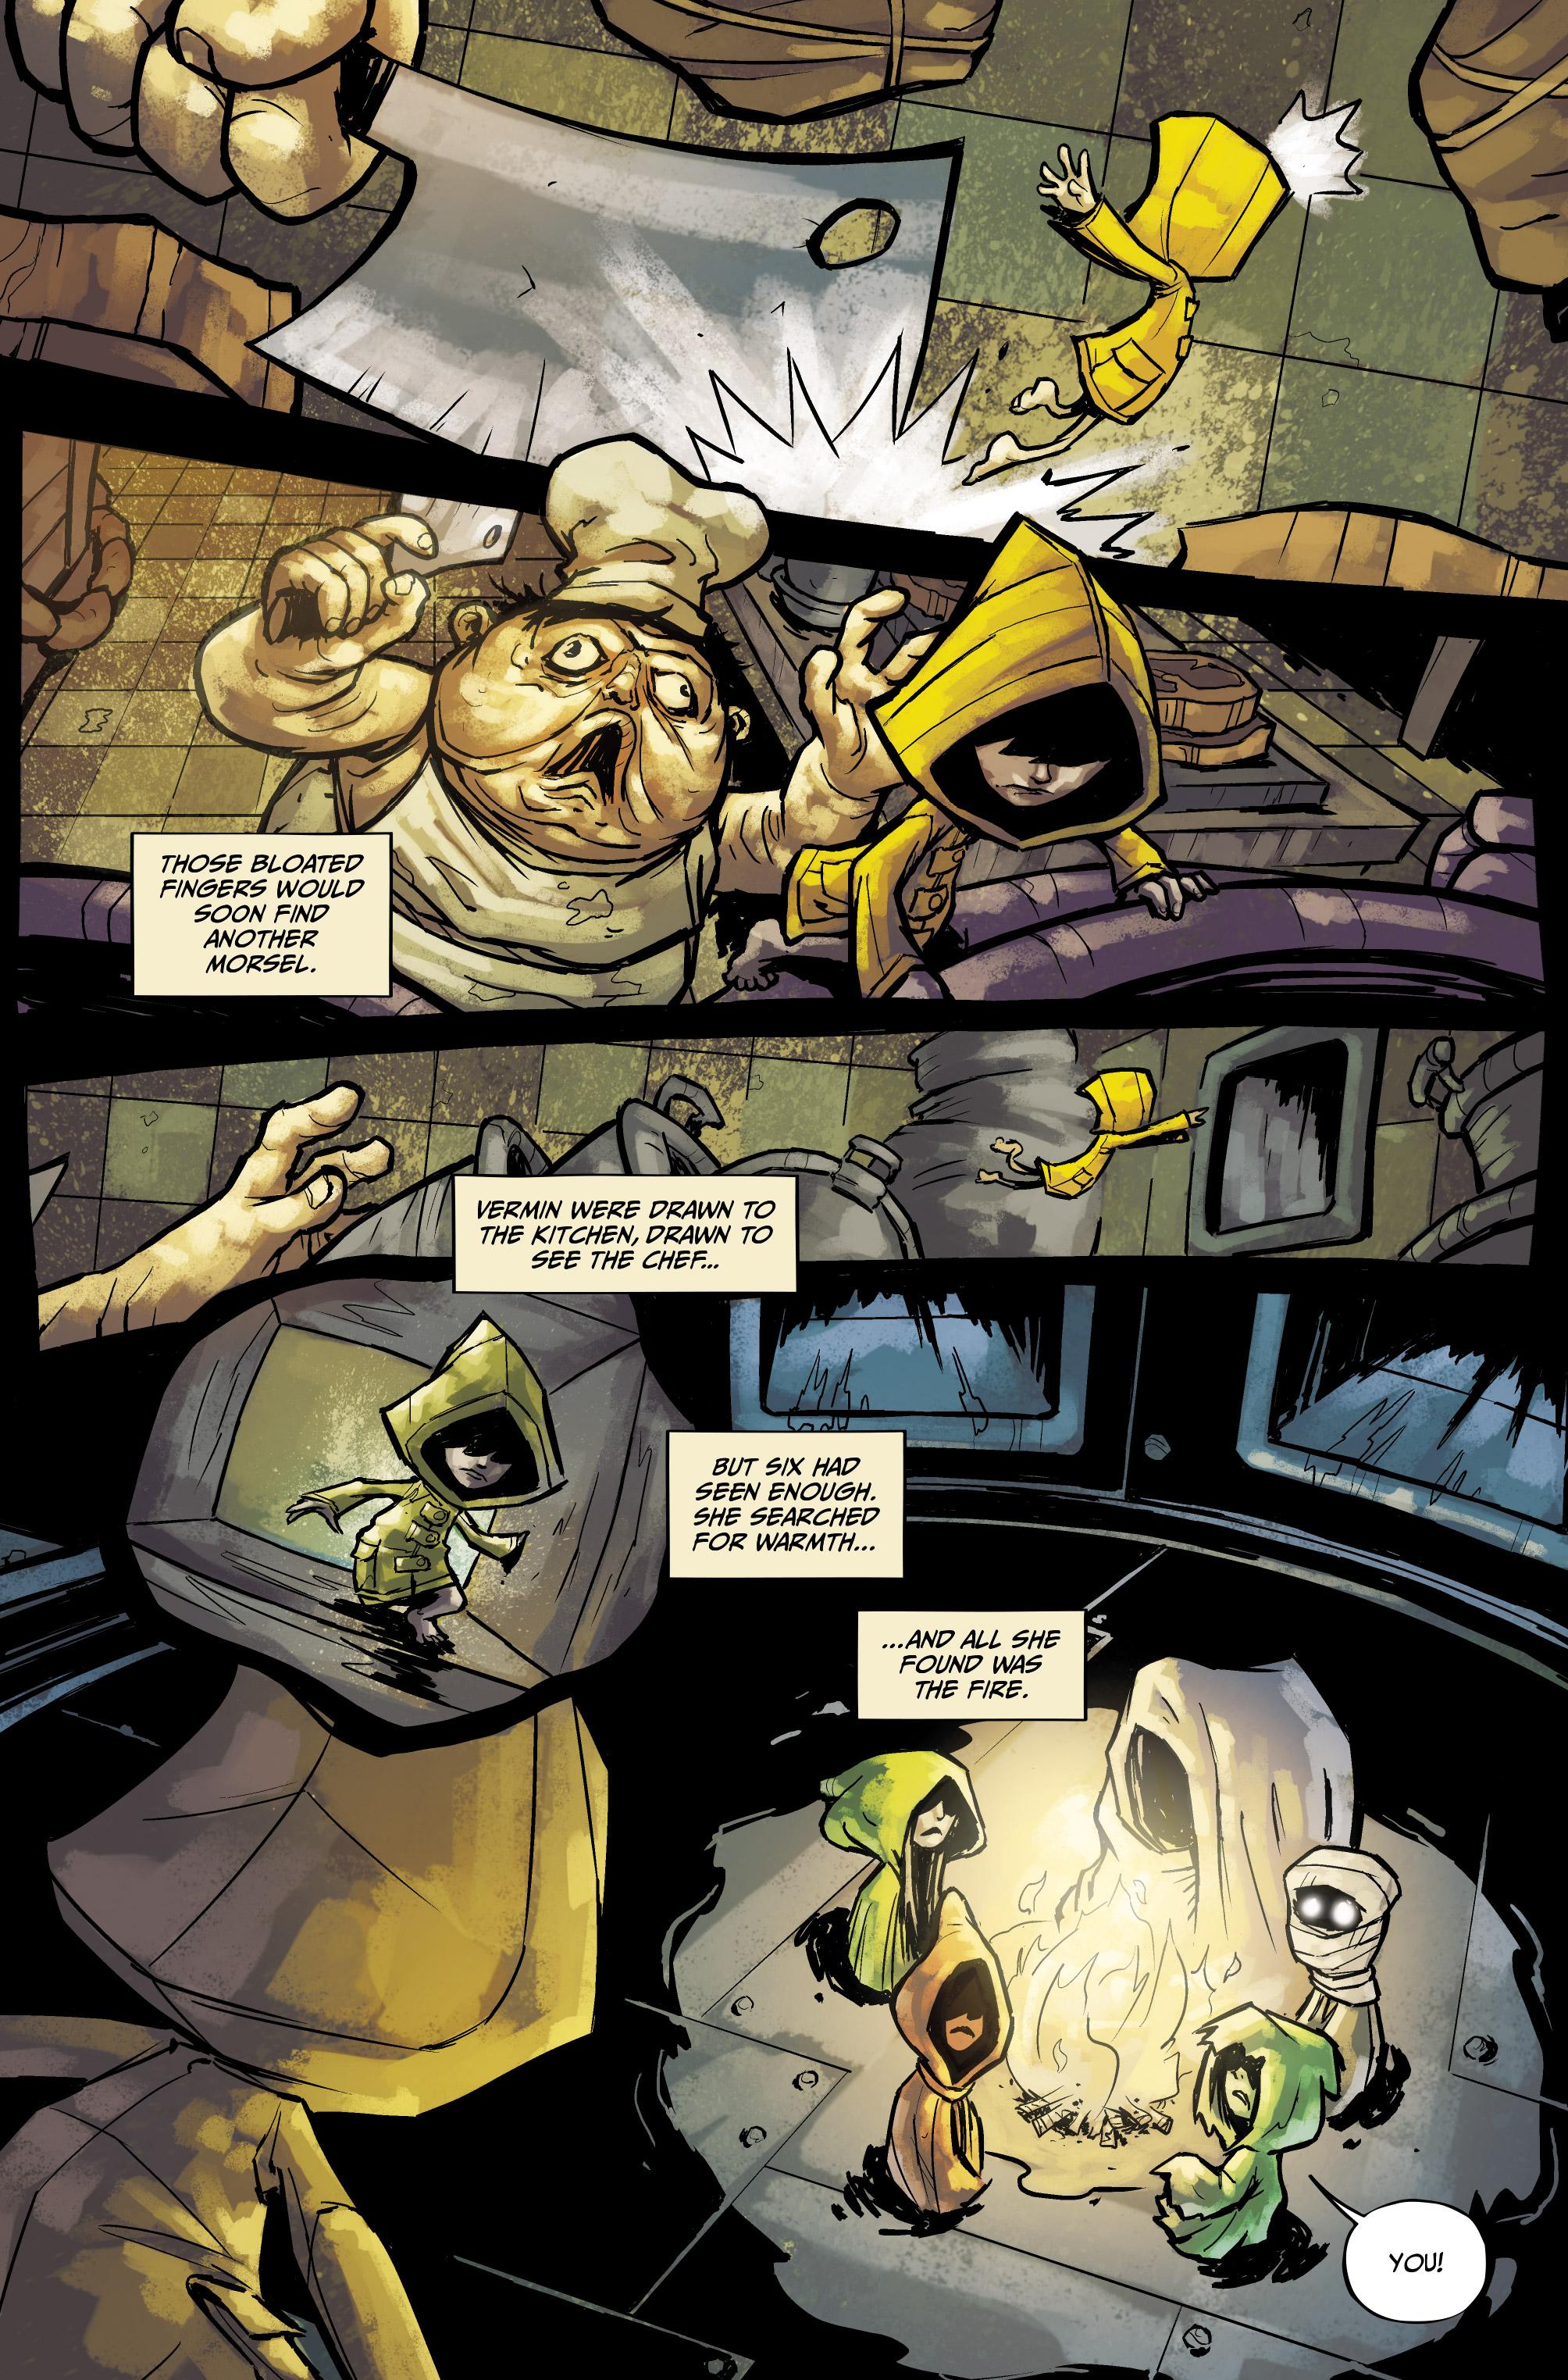 Read online Little Nightmares comic -  Issue #1 - 3